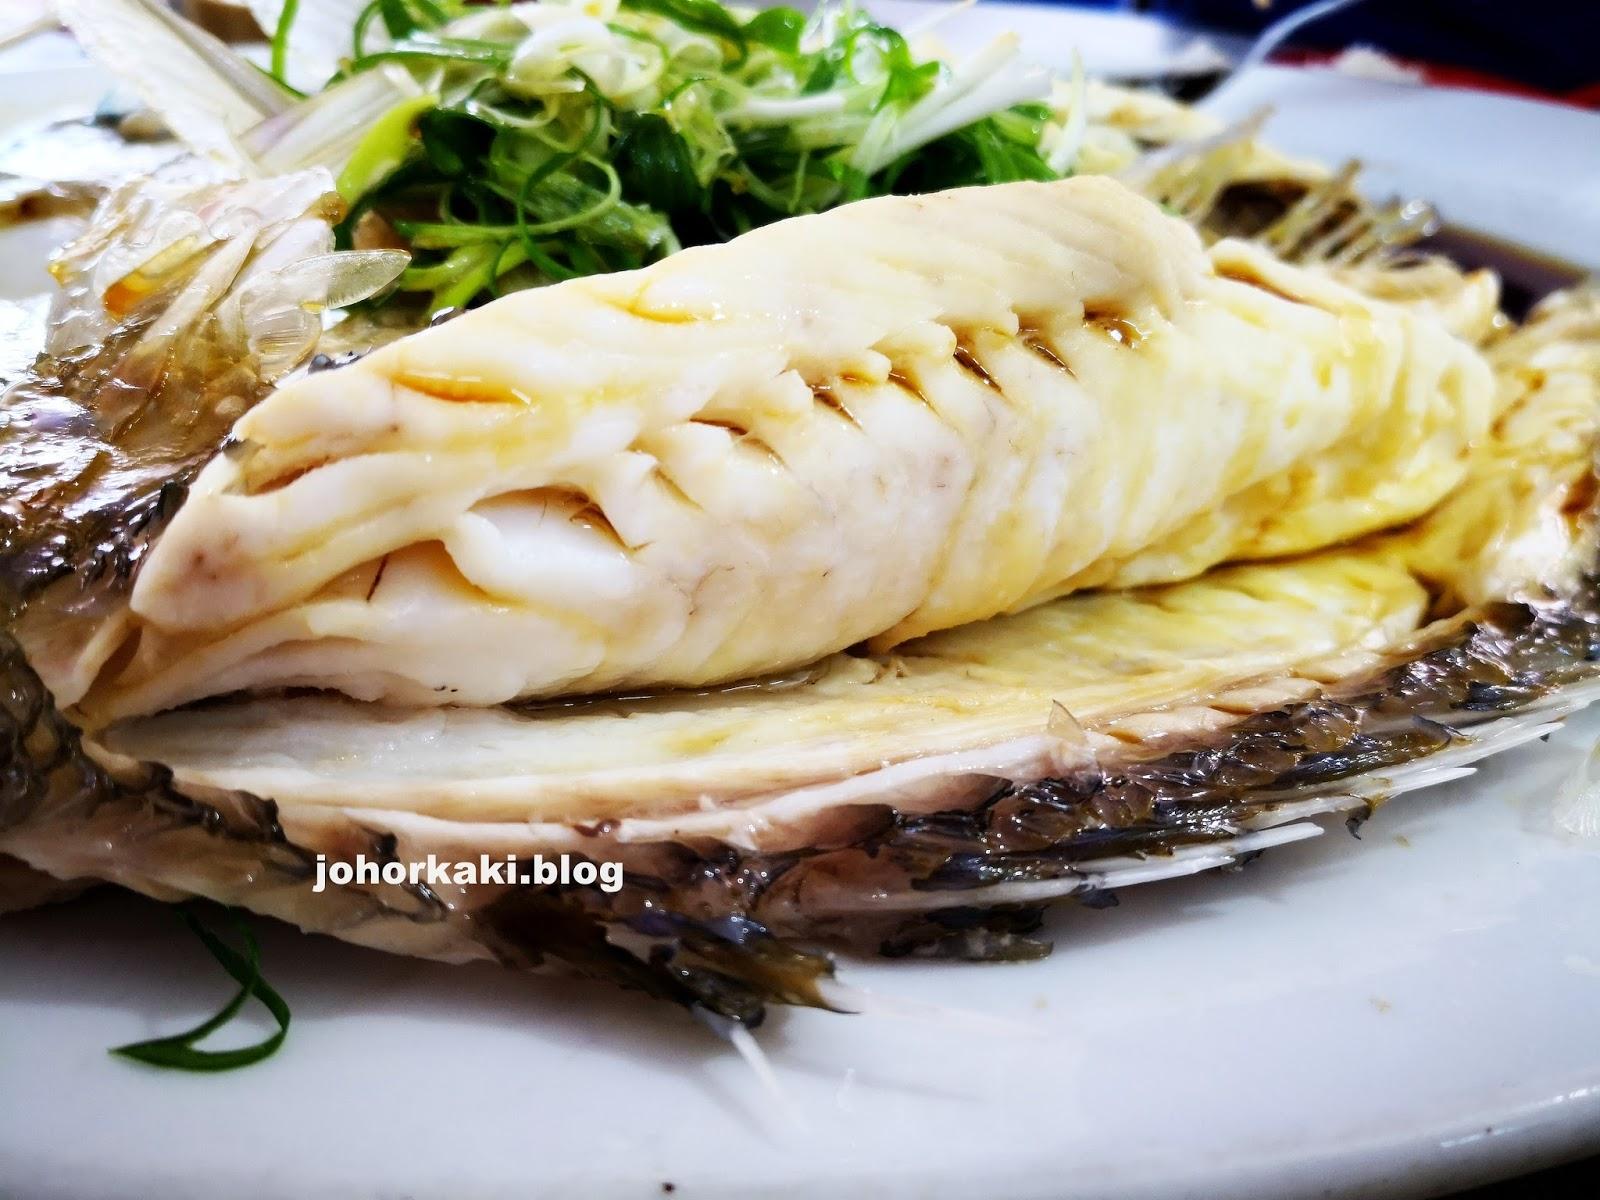 Zai shun restaurant quality fish at kopitiam prices for Plenty of fish cost